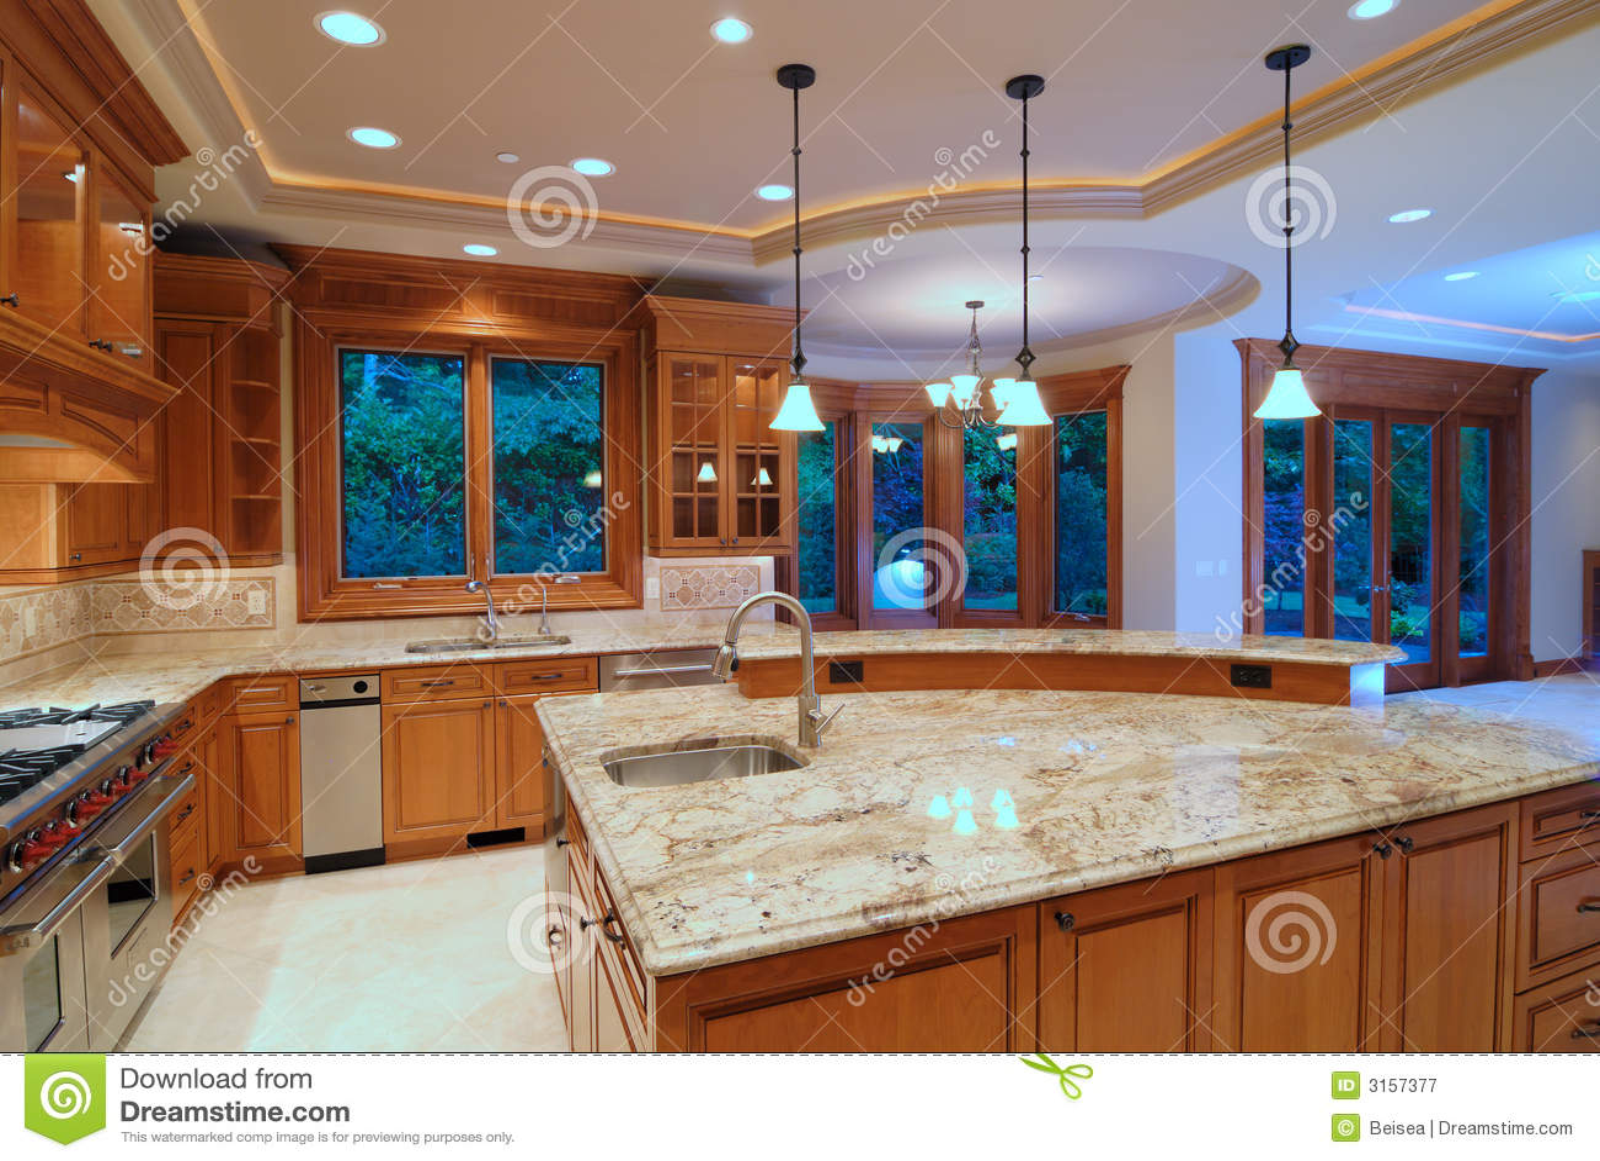 designer kitchen royalty stock photography image designing kitchen kitchen decor design ideas